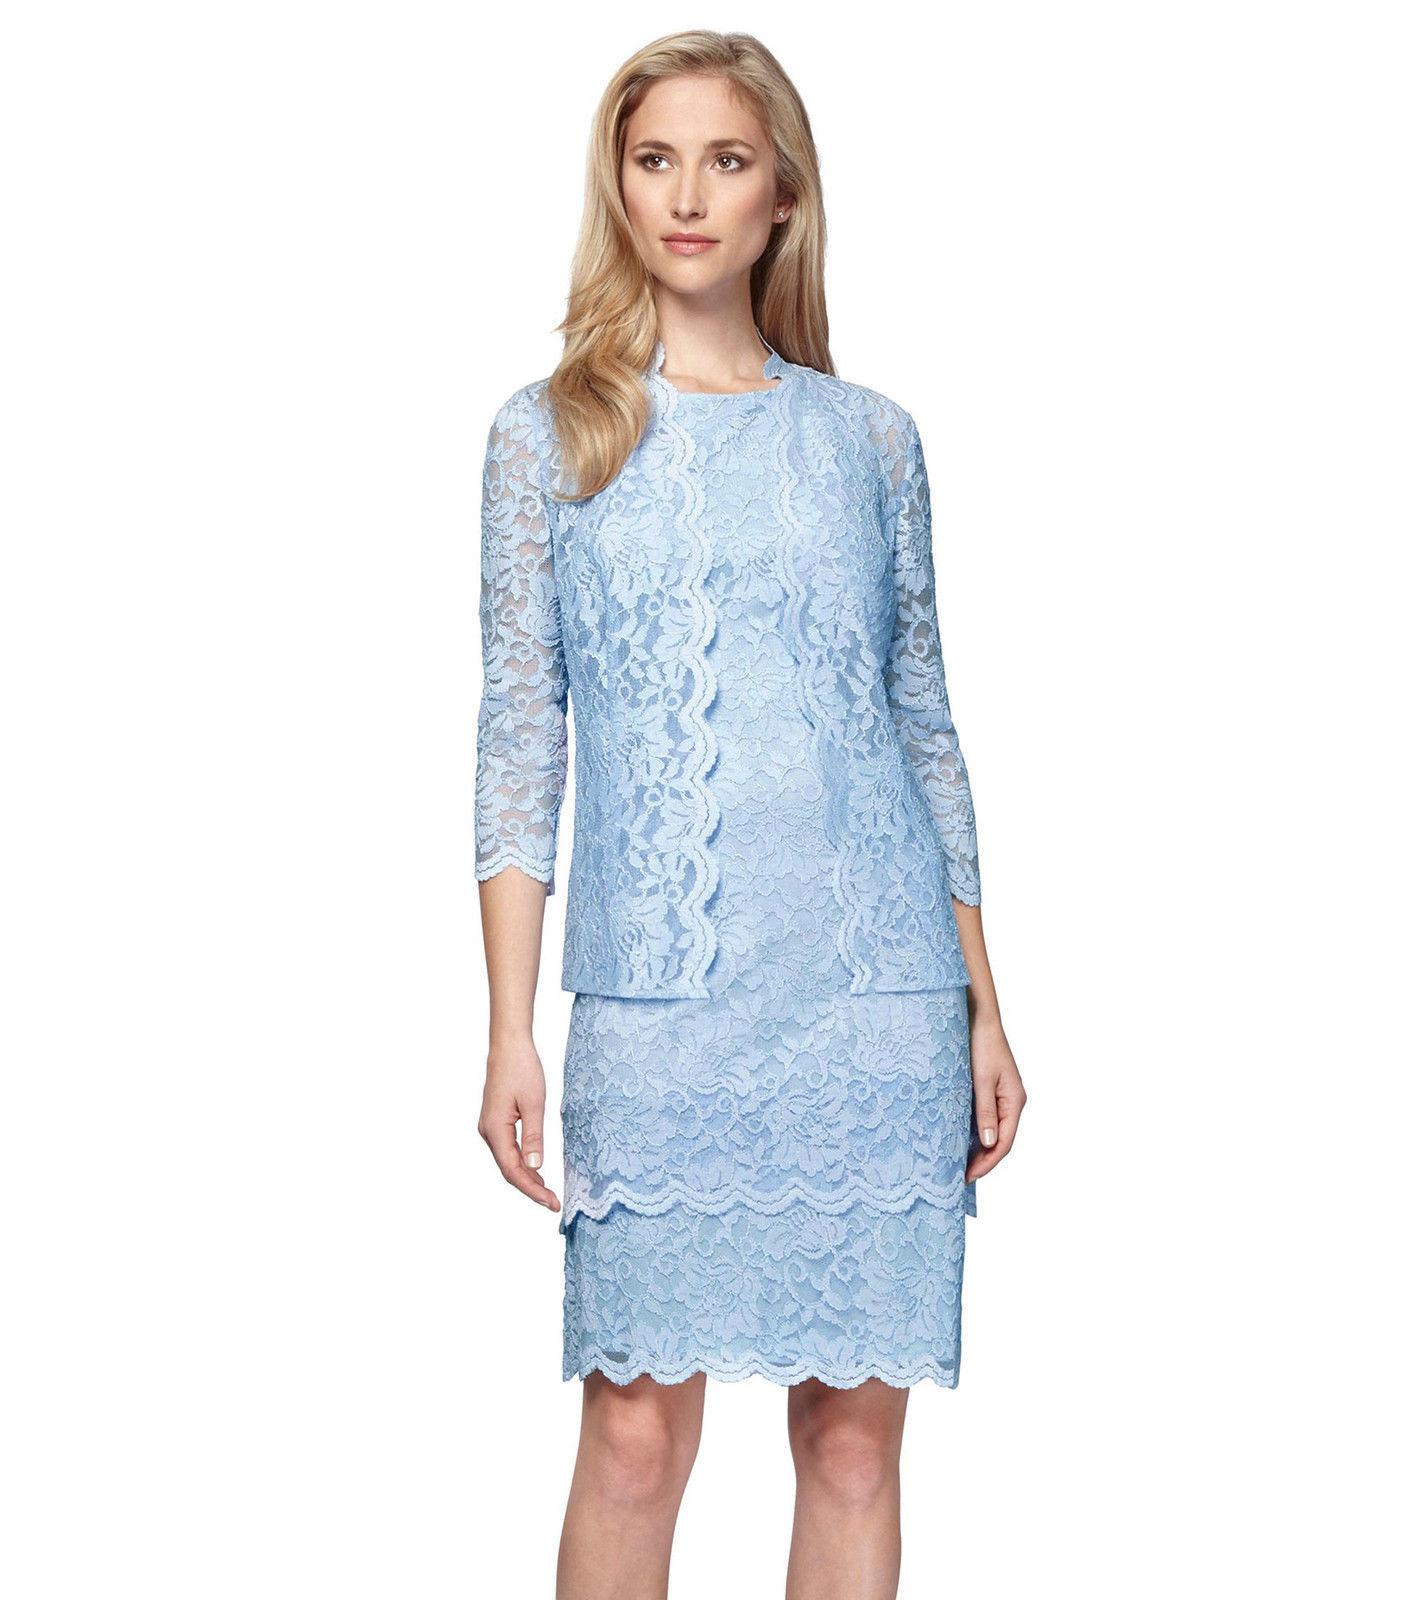 NWT-ALEX EVENINGS Größe 8 Blau Lace Woherren Jacket & Dress 2-Piece Retail